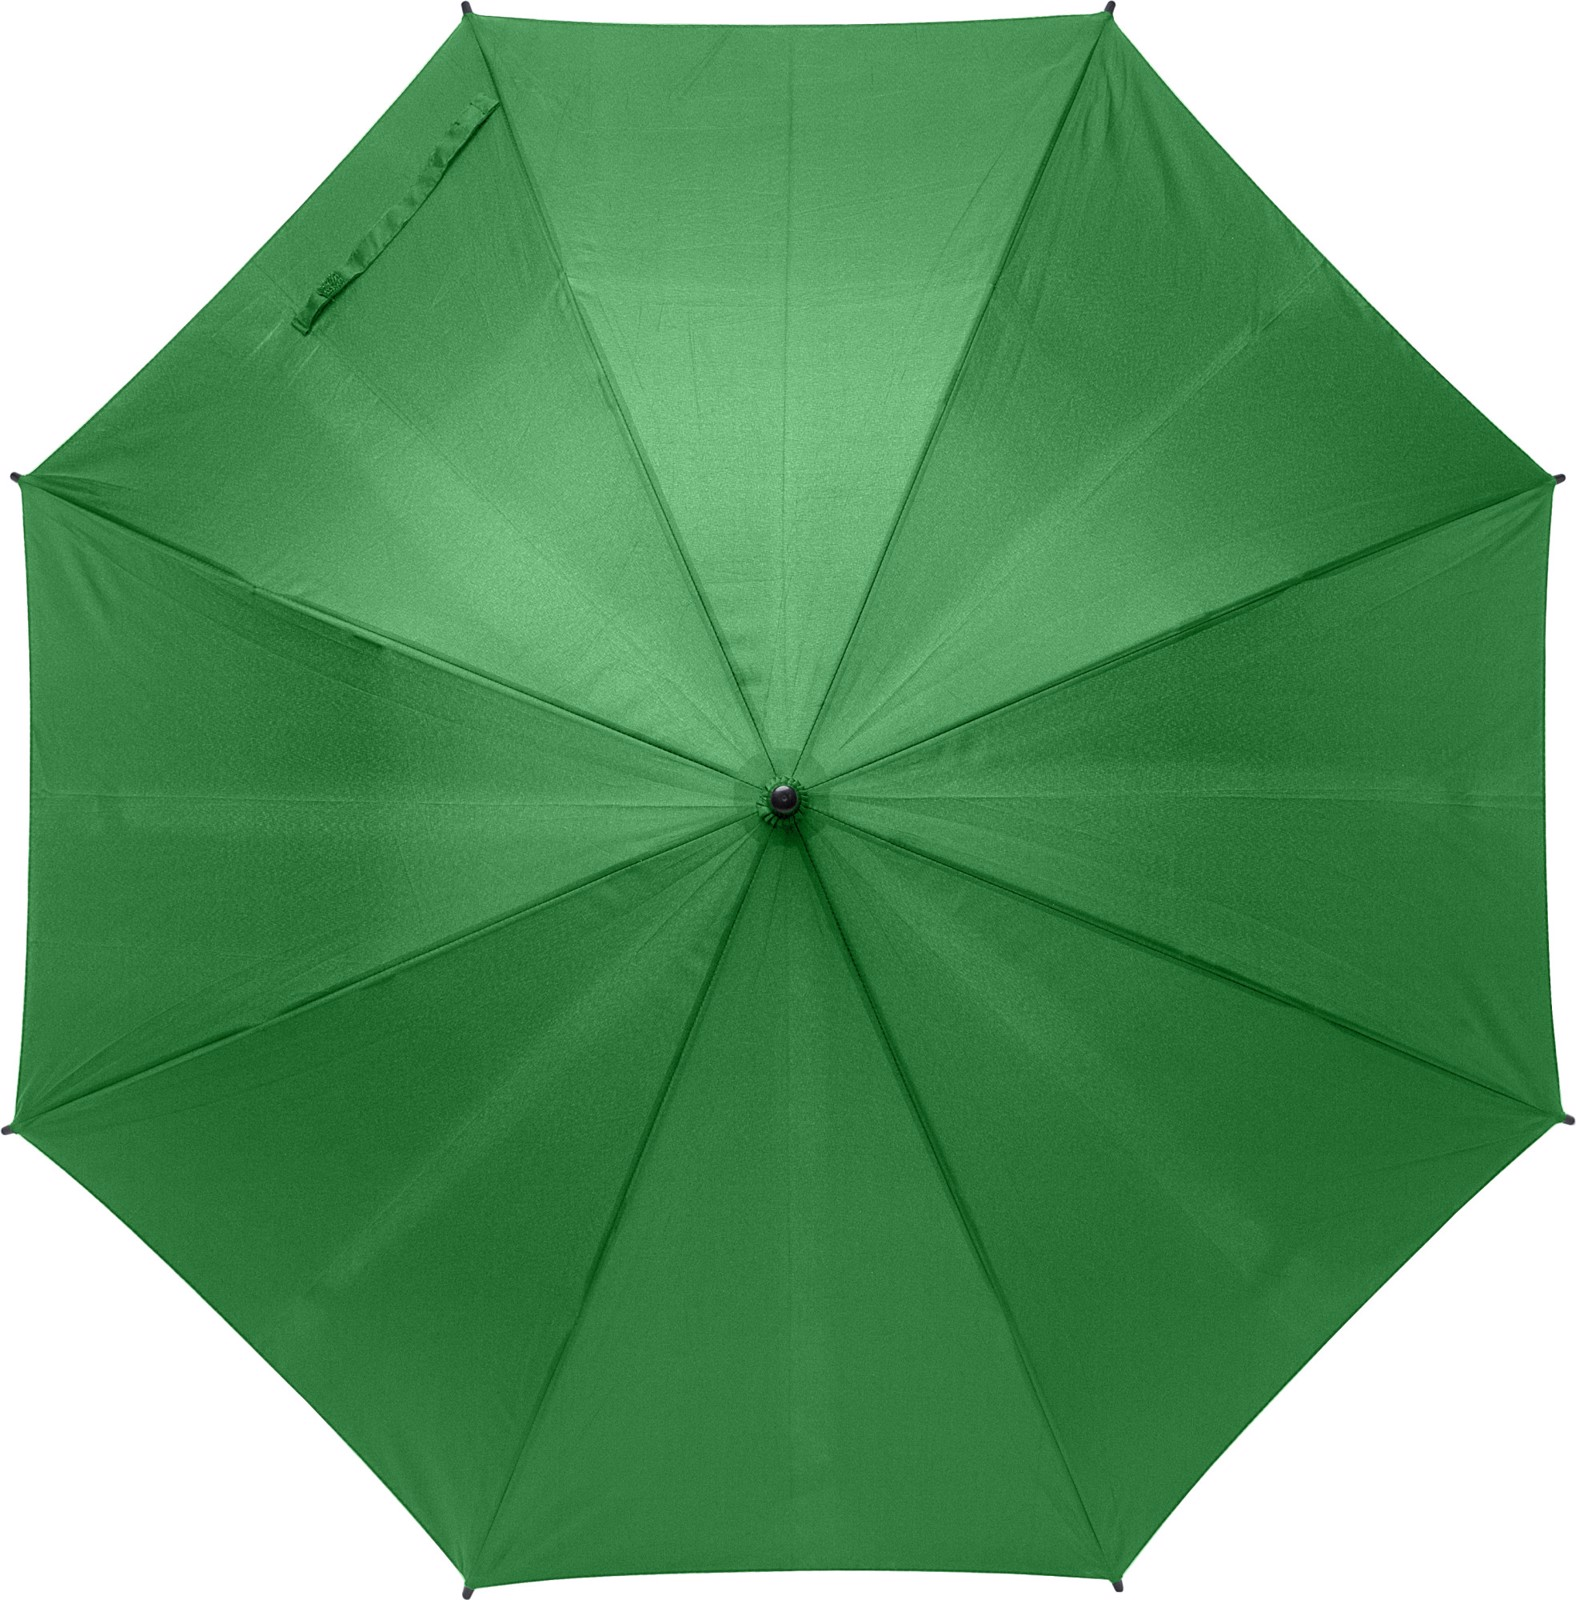 RPET pongee (190T) umbrella - Green